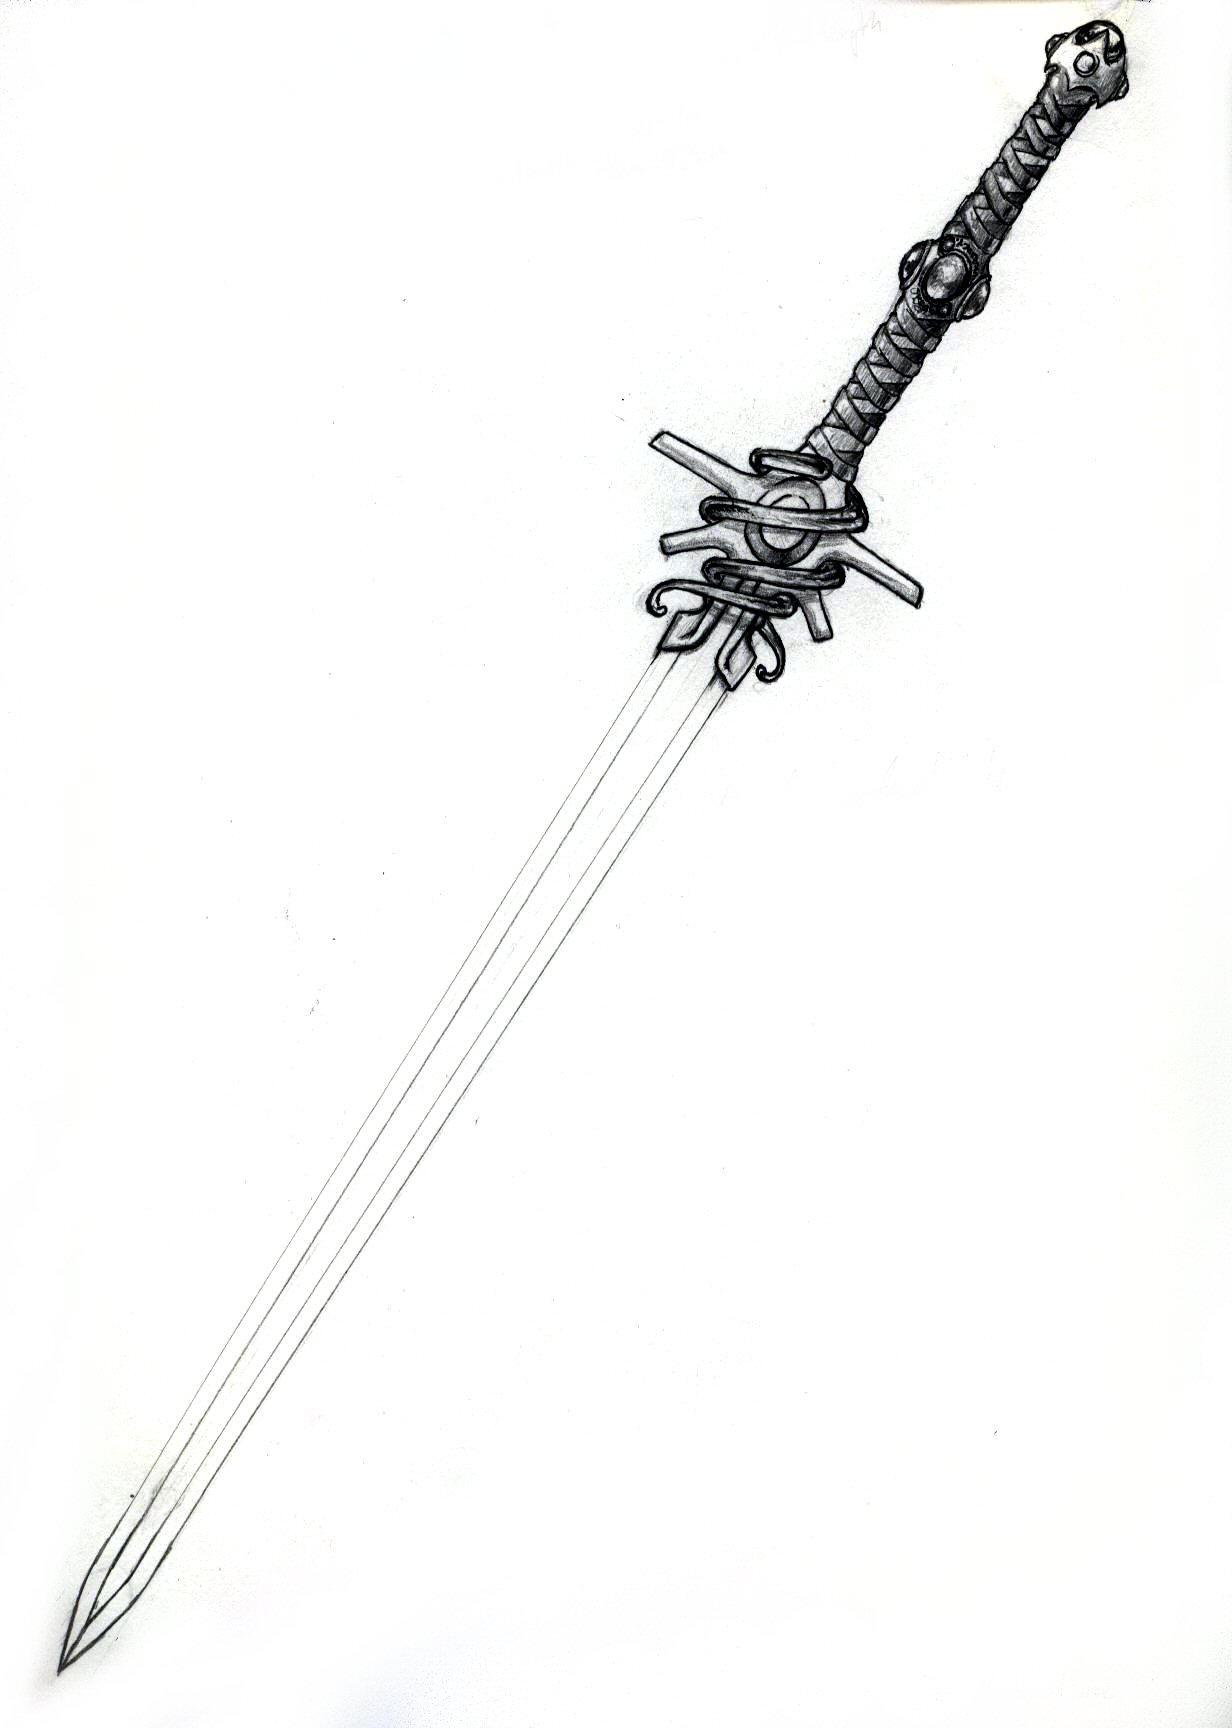 Amethyst Sword-Pen and Pencil by Gerak on DeviantArt